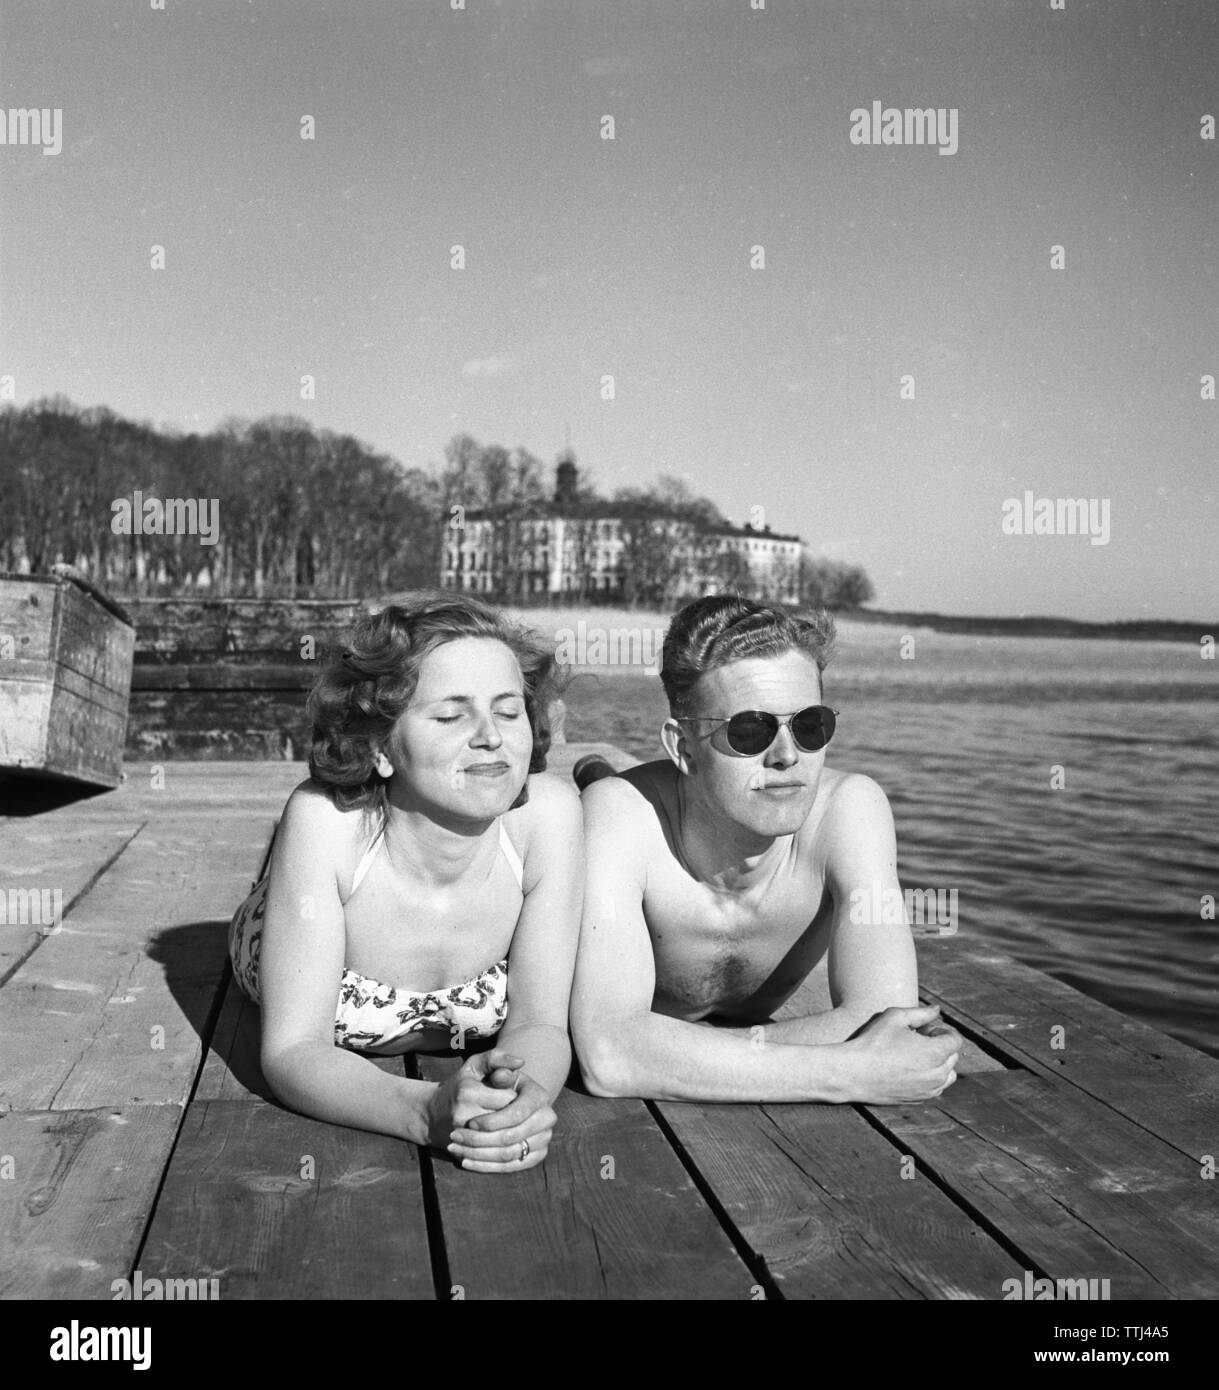 Couple Enjoying Their Summer Holidays Stock Photo: Girls Beach Sweden Stock Photos & Girls Beach Sweden Stock